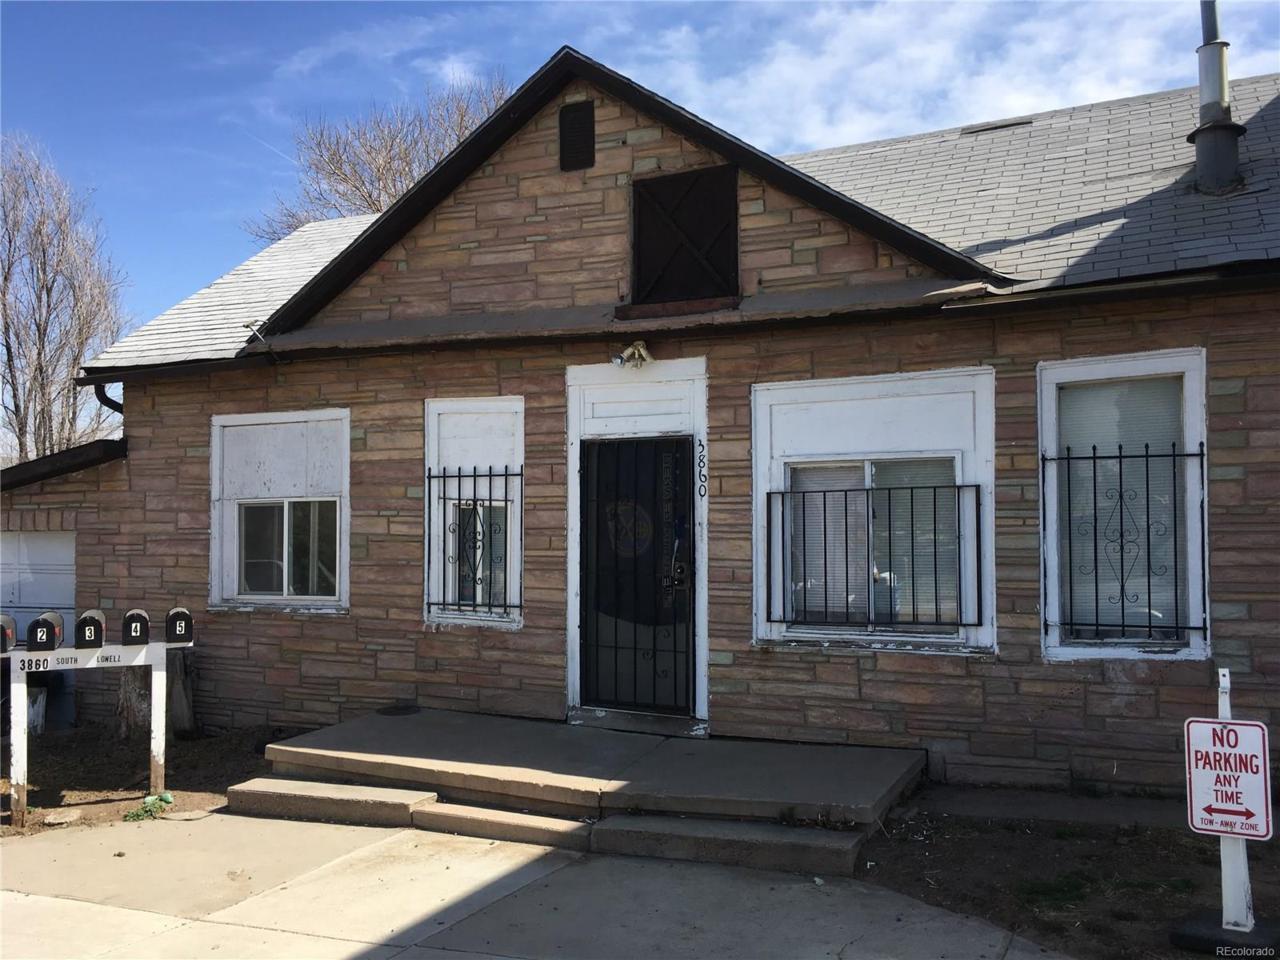 3860 S Lowell Boulevard, Denver, CO 80236 (MLS #1703226) :: 8z Real Estate